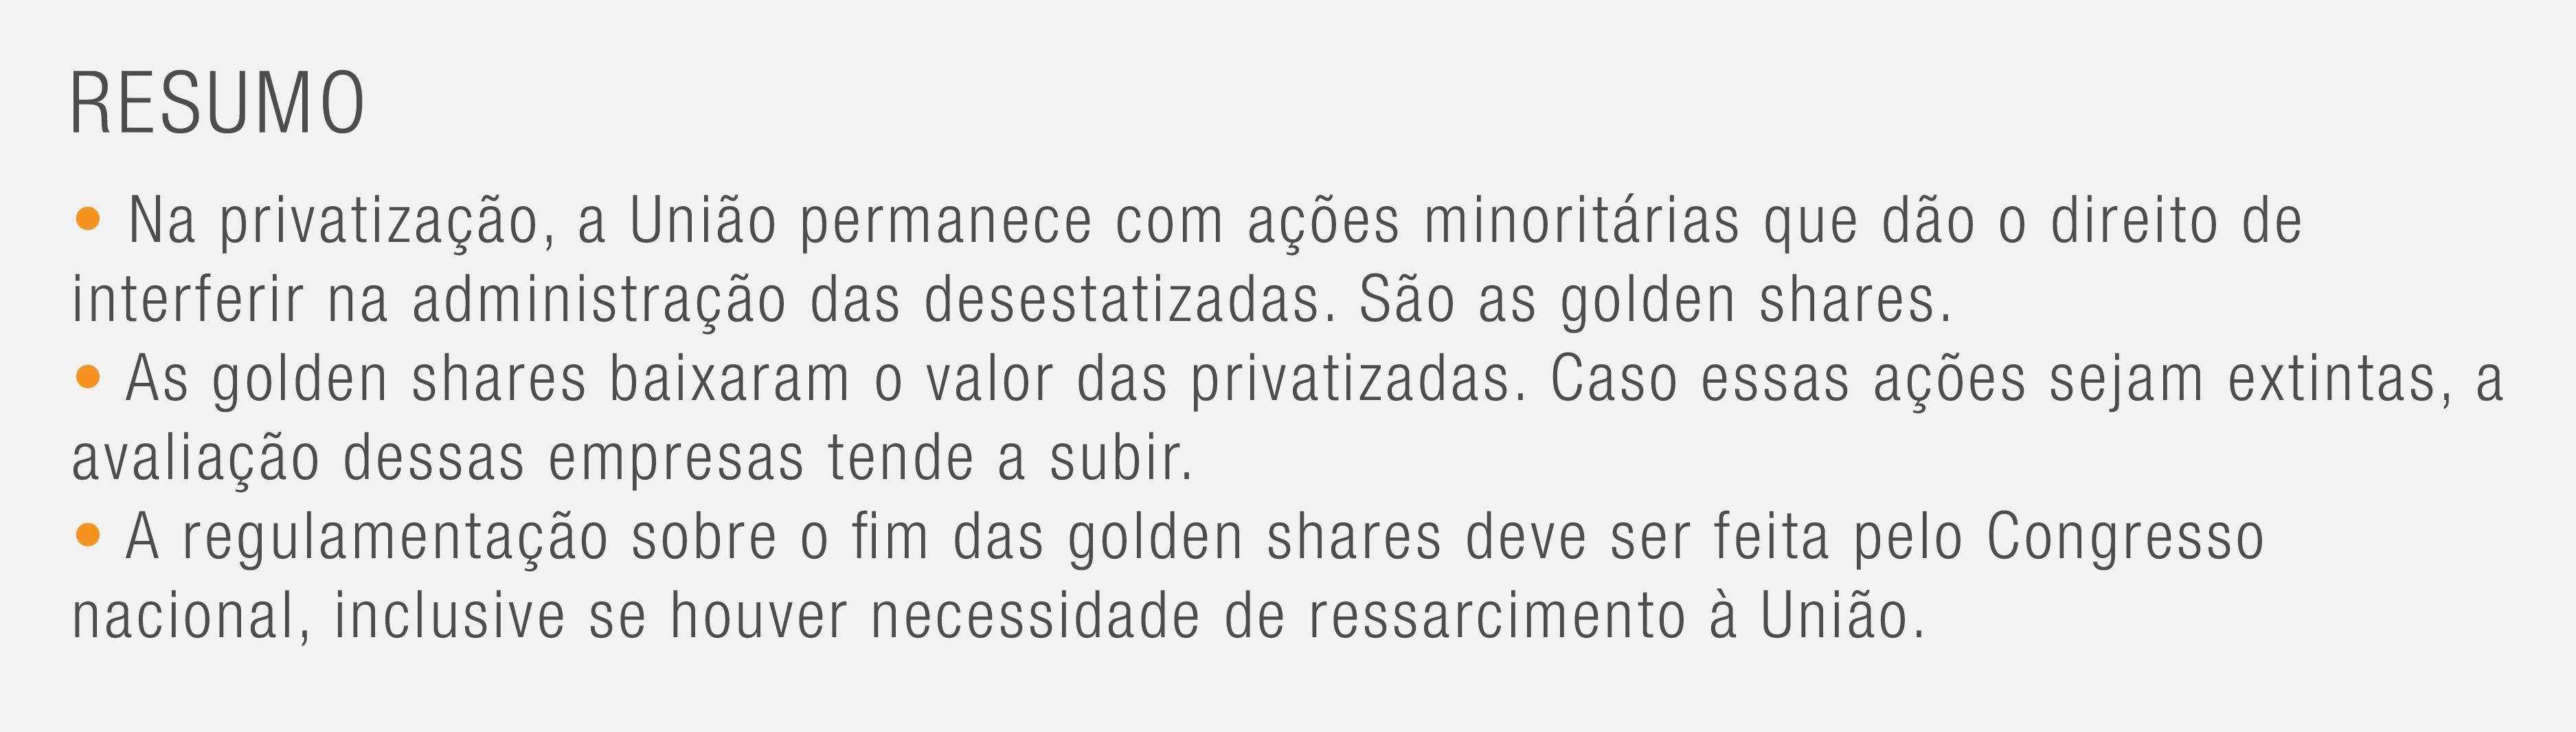 Quadro_resumo_padrao_golden-01-01.jpg